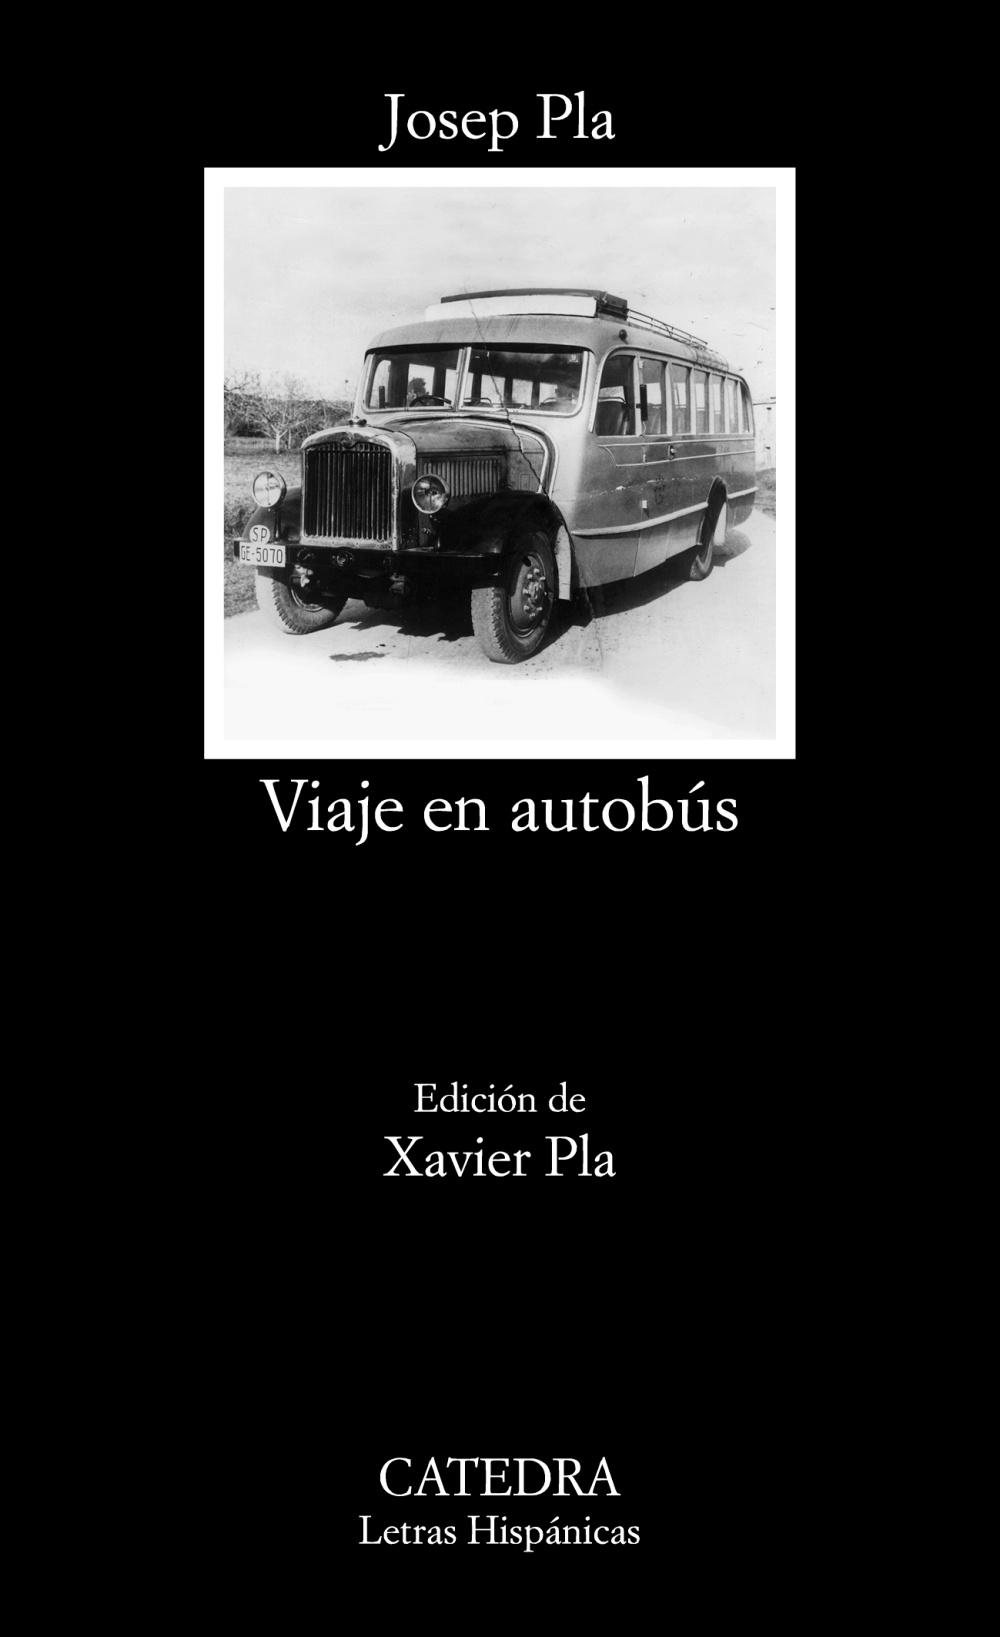 <p><em>Viaje en autobús</em>, de Josep Pla, un retrato moral de la posguerra</p>